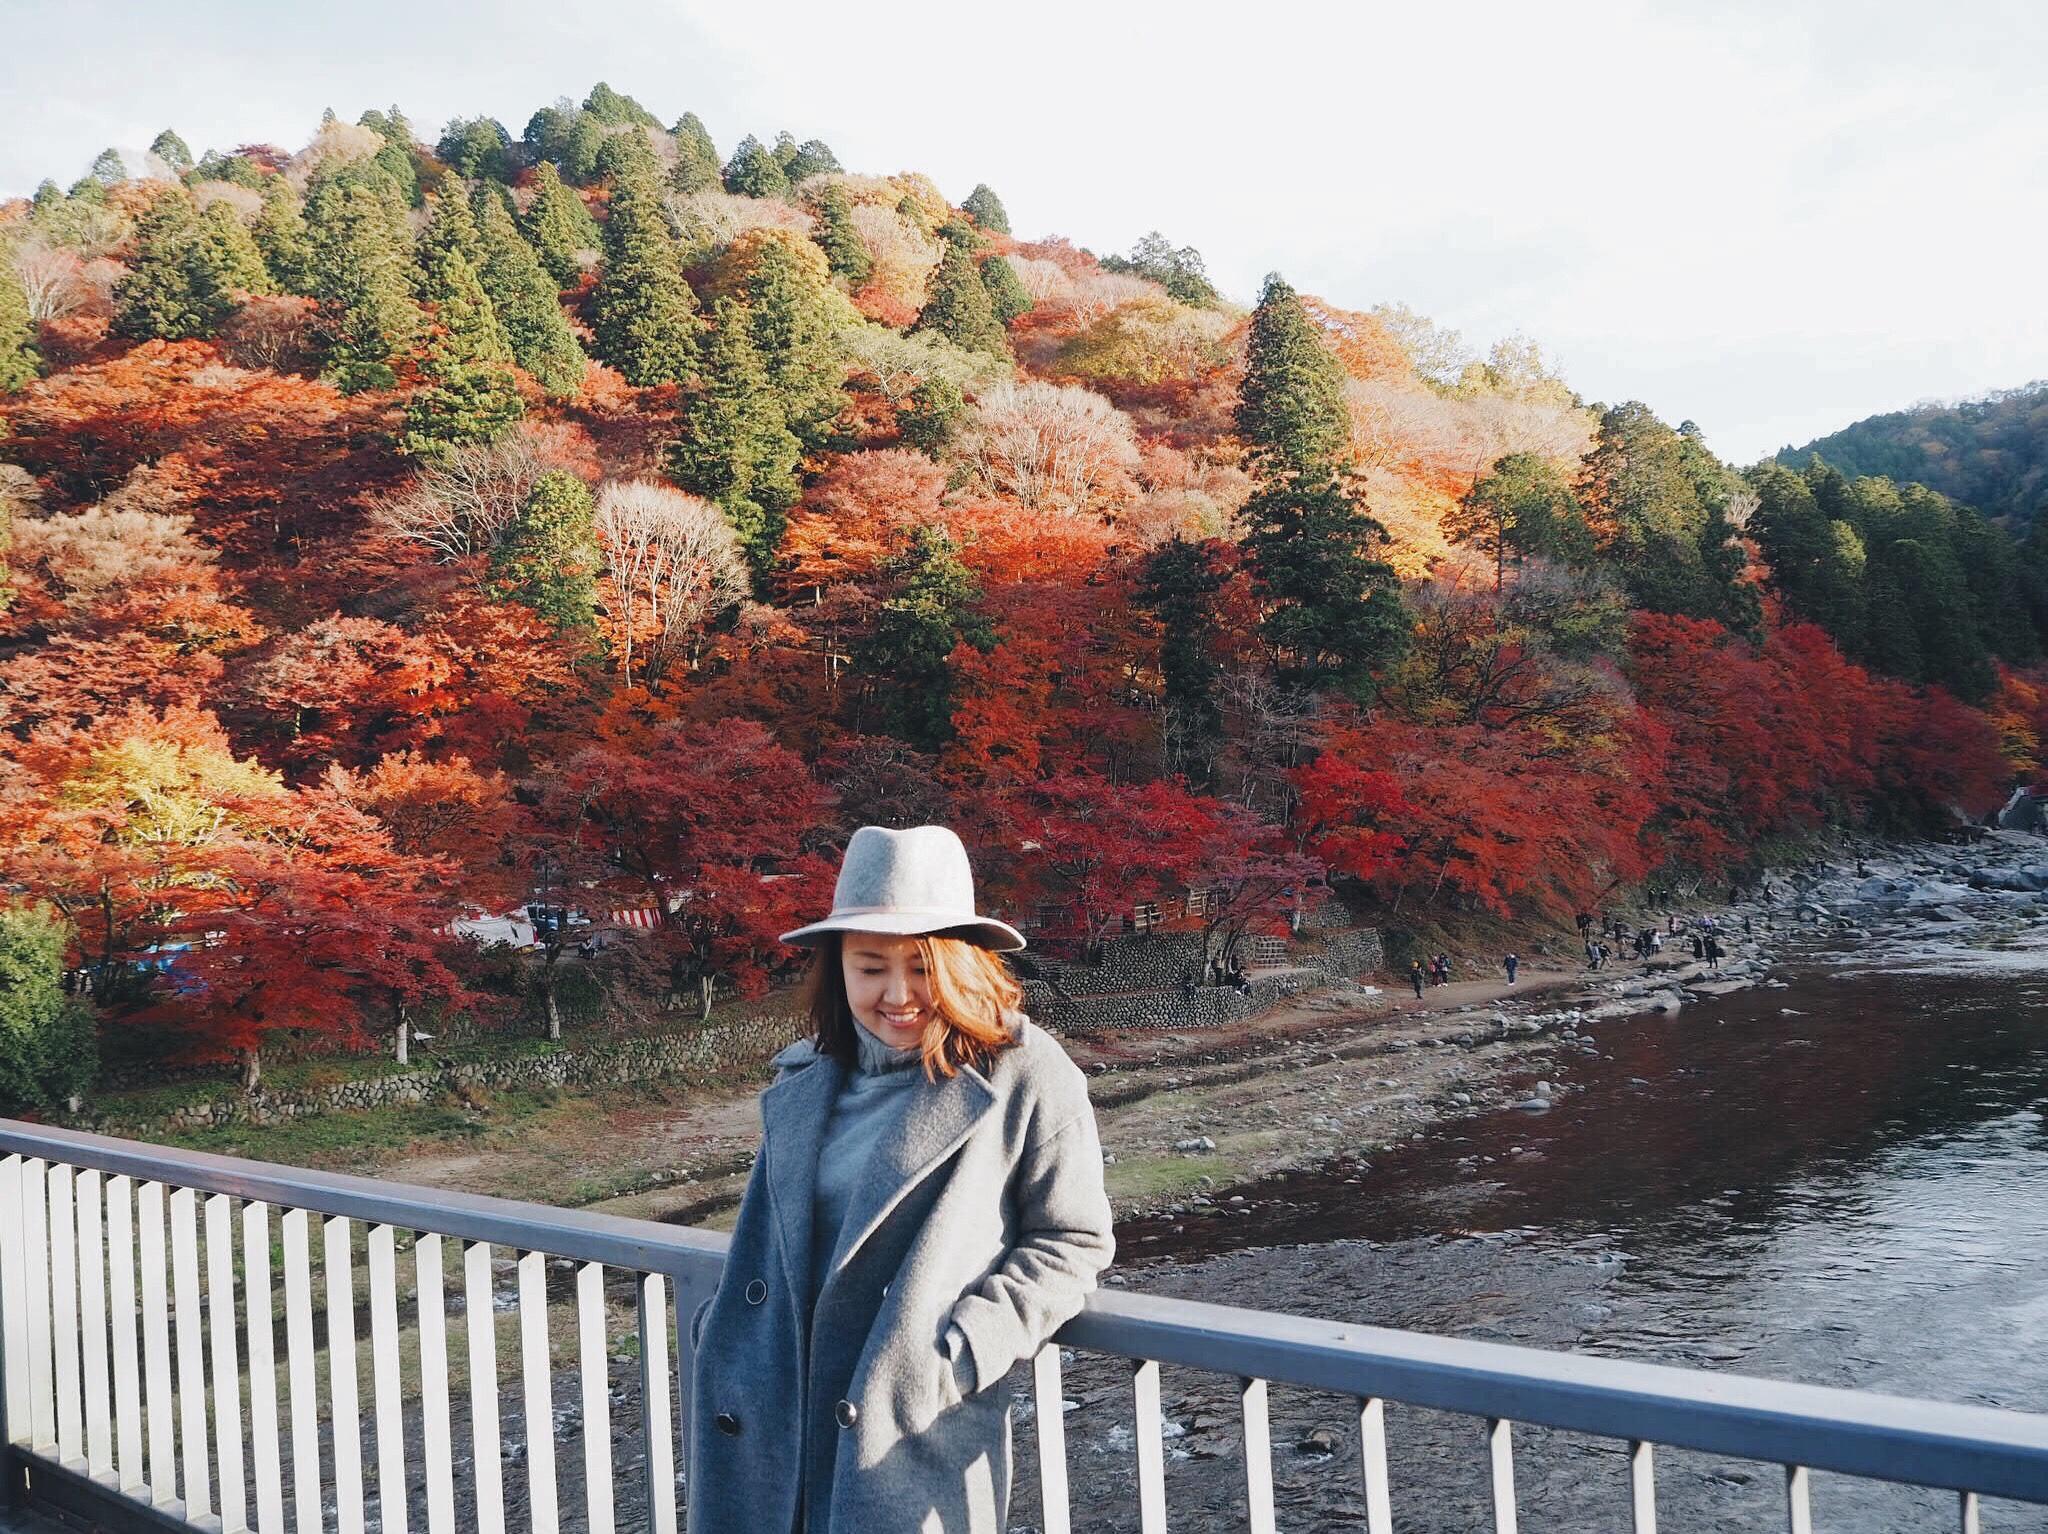 img 7616 - 香嵐渓 - 日本の秋を感じる 愛知県豊田市の紅葉スポット